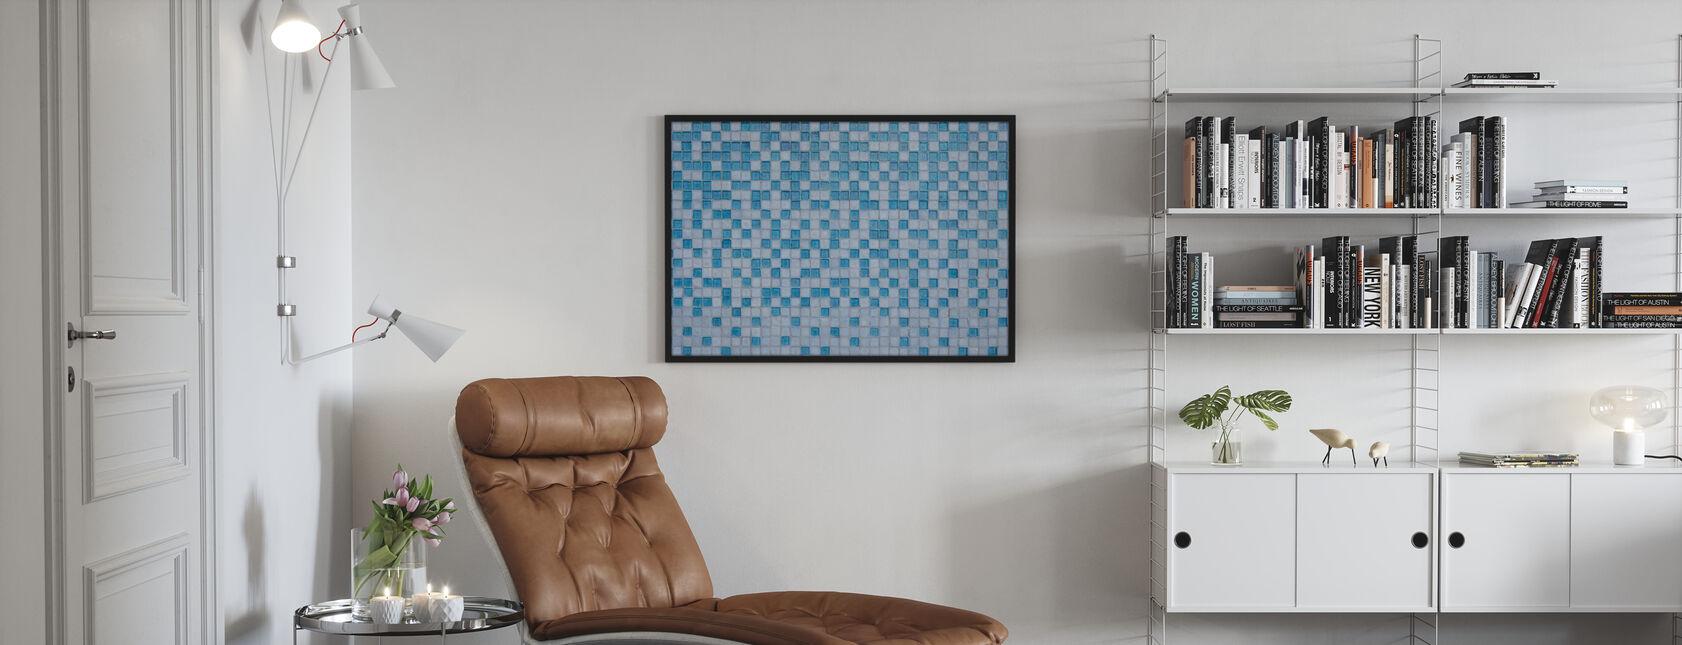 Miami Mosaik - Plakat - Stue